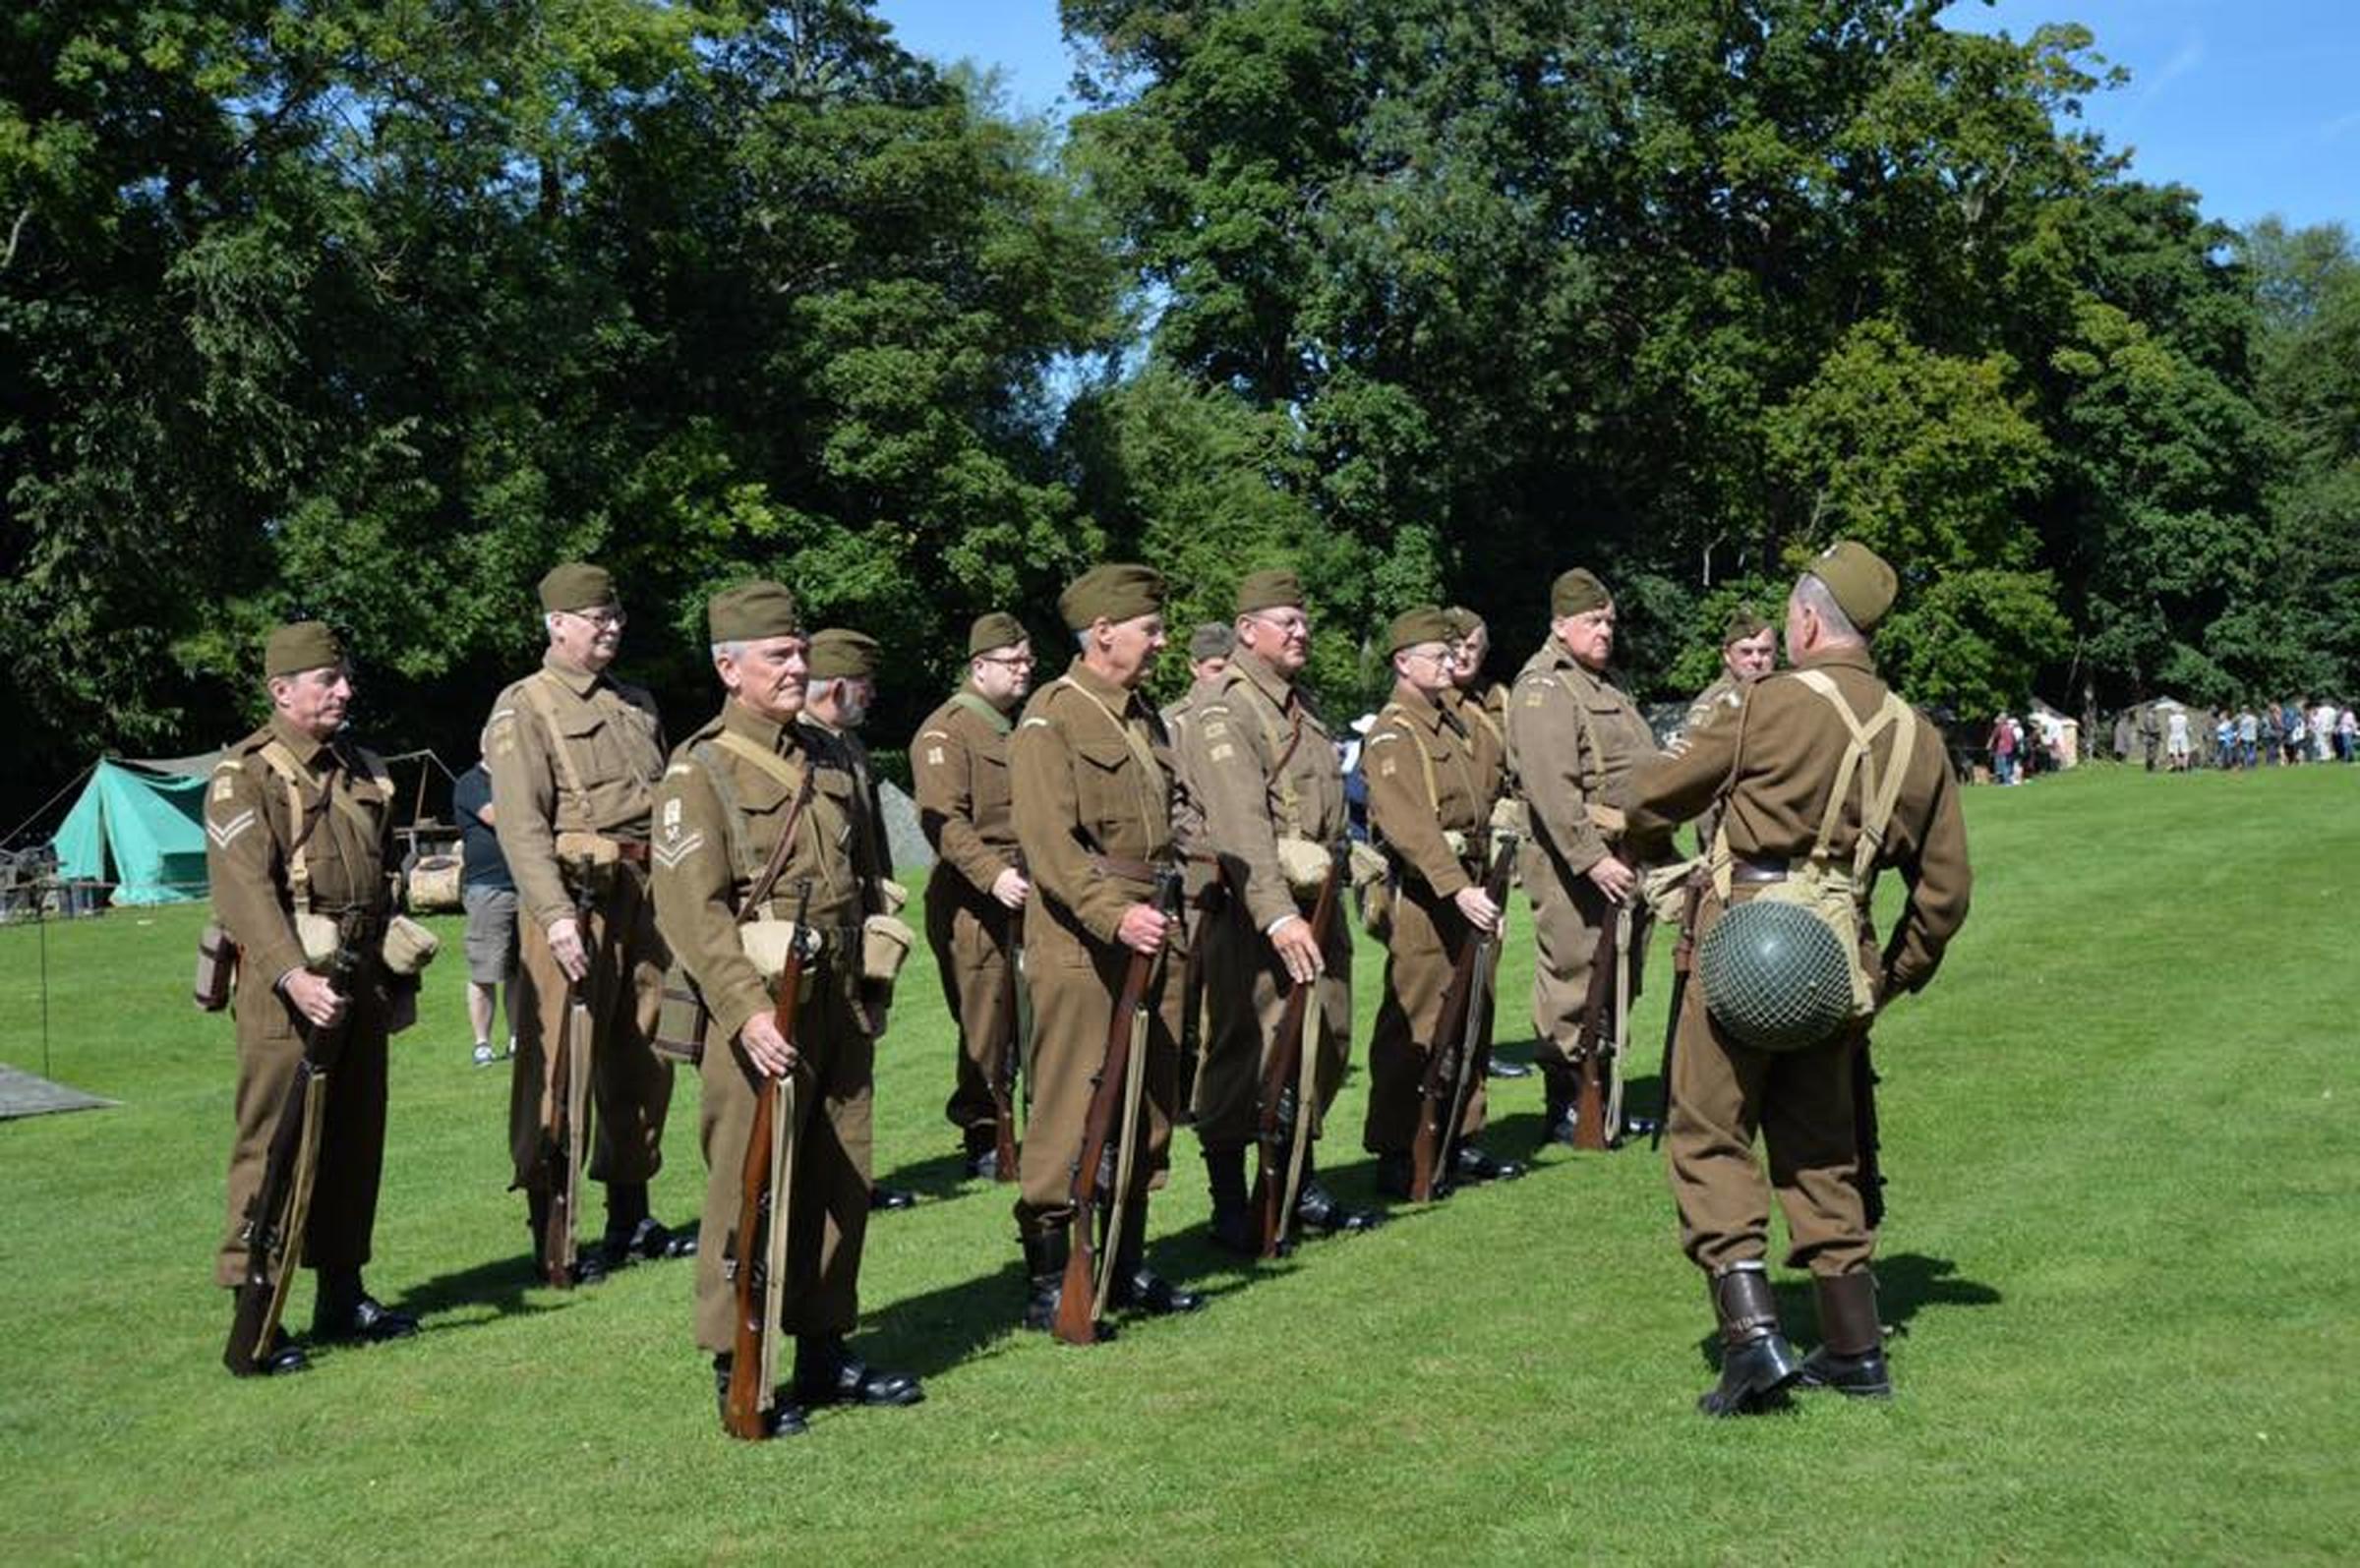 Re-enactors will patrol Abingdon Lock for Thames at War event